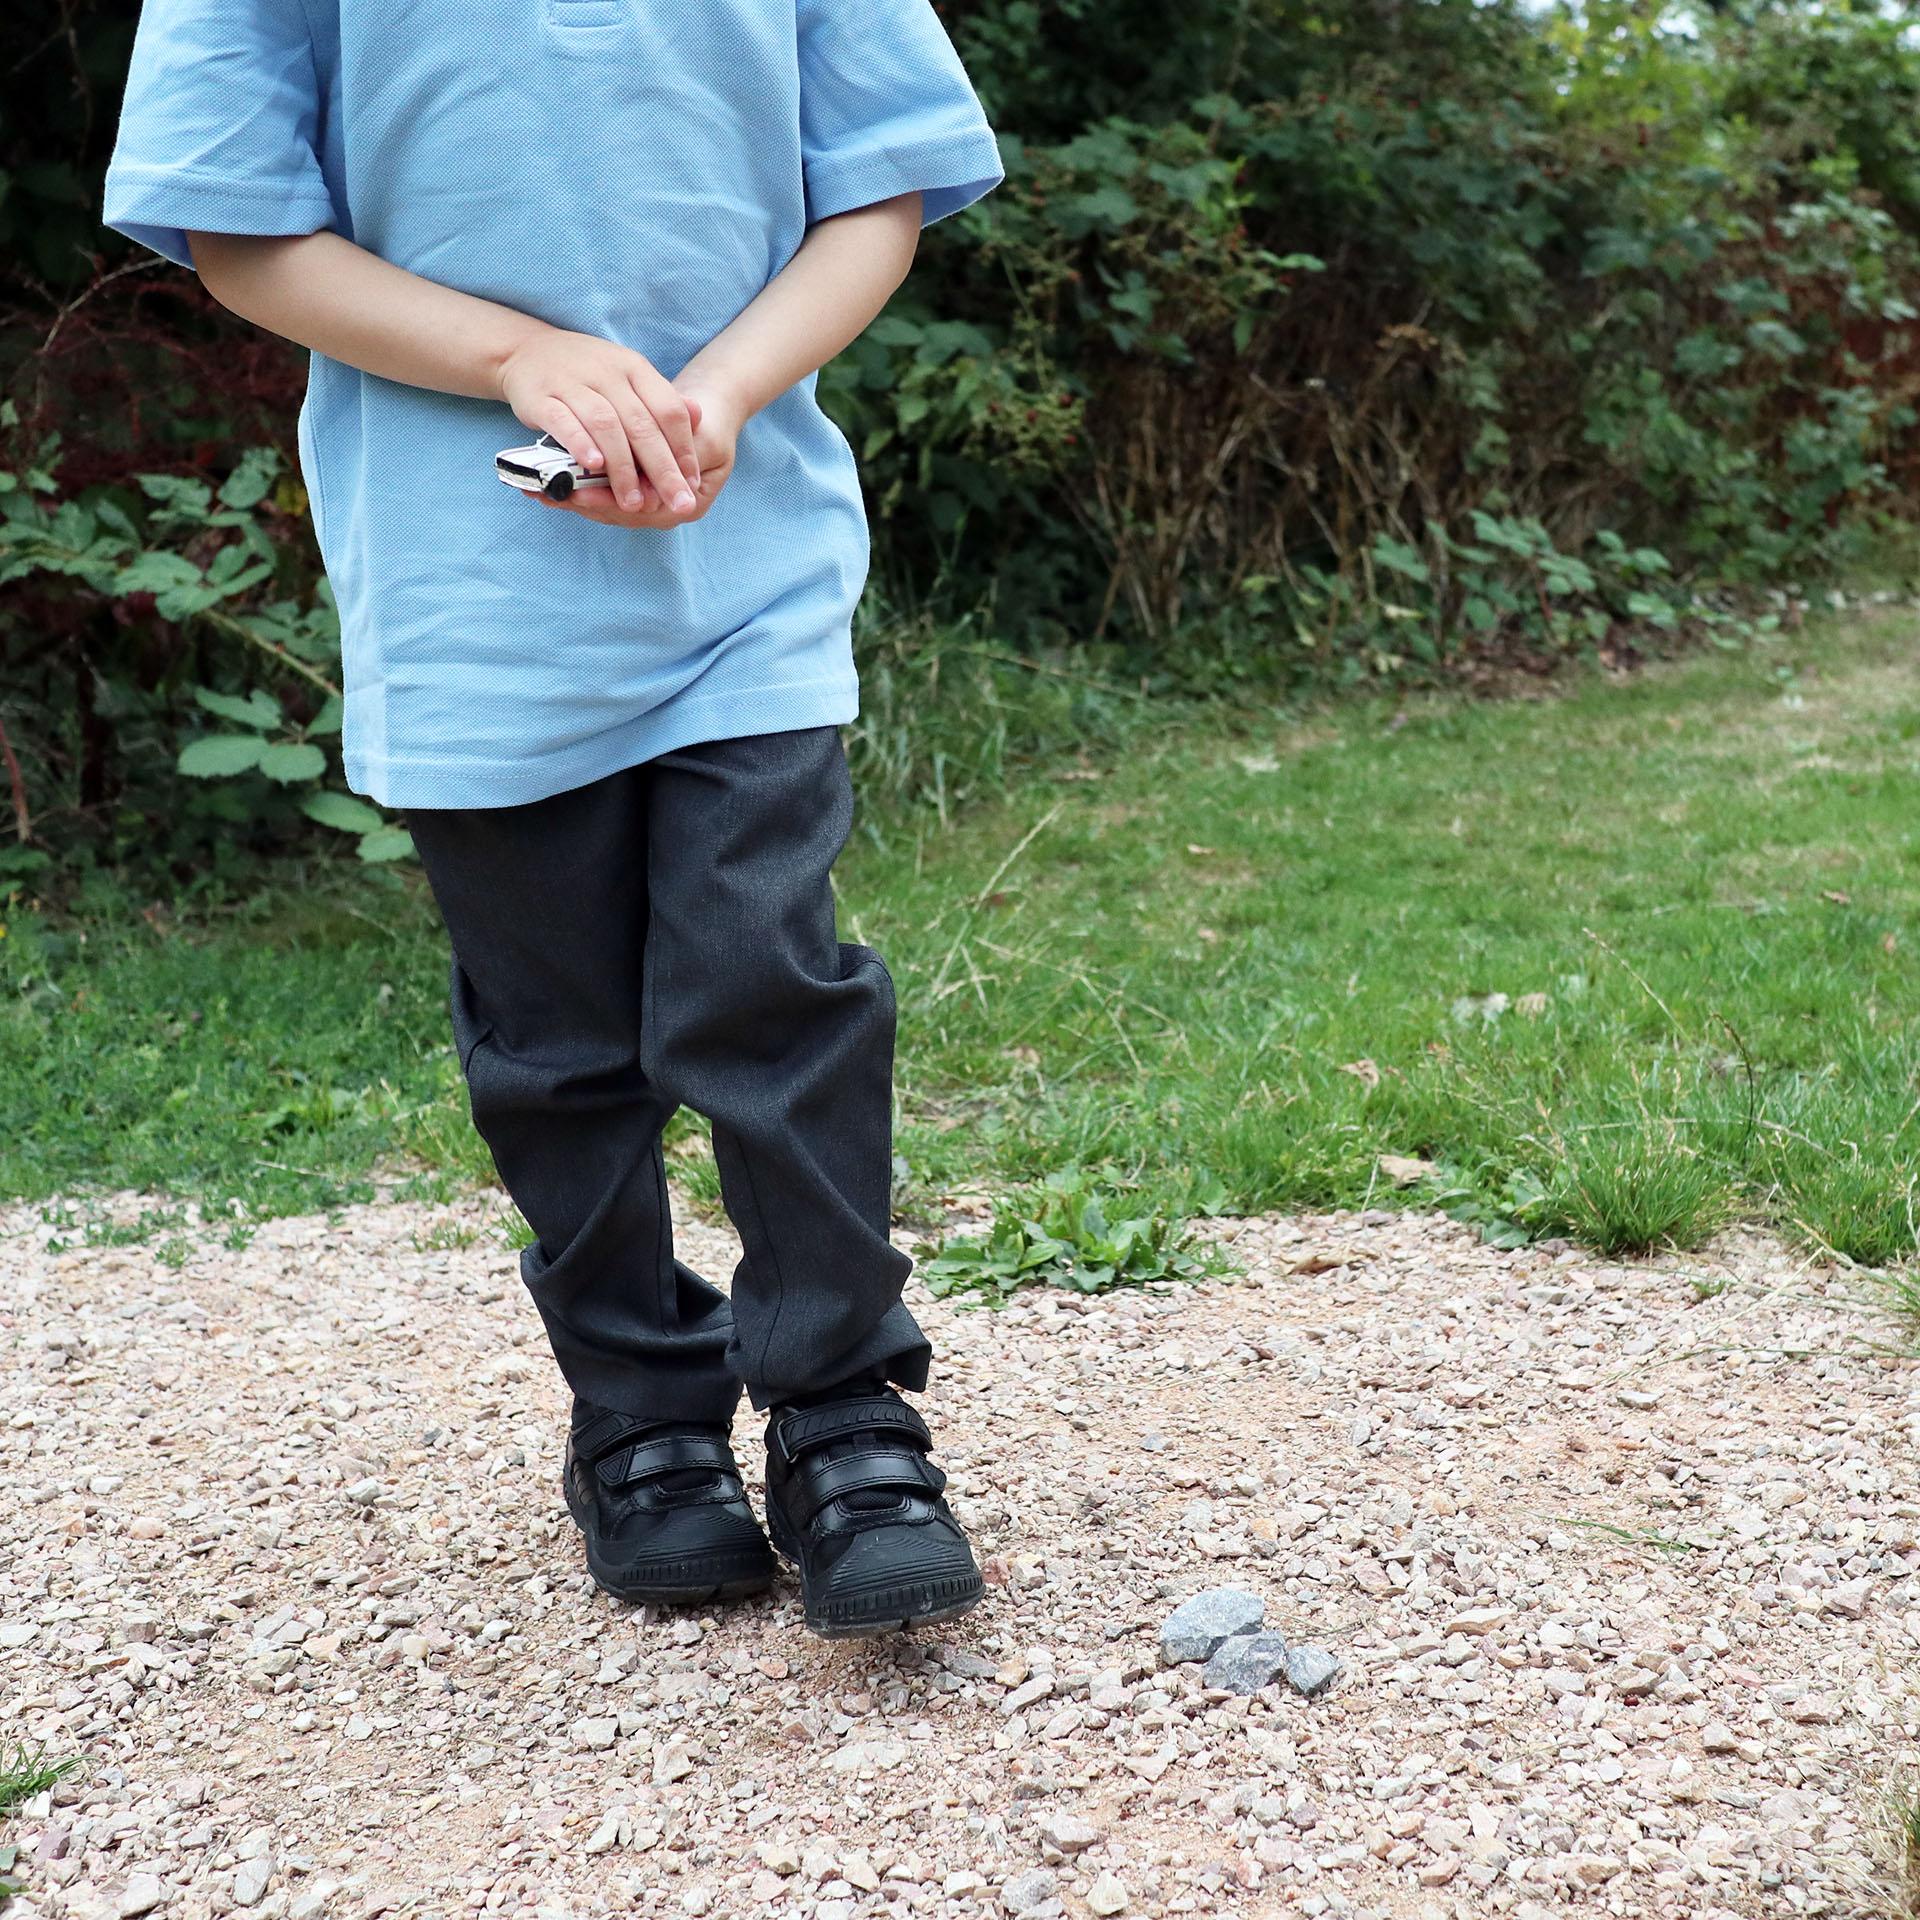 Child in school uniform wearing Start-Rite Extreme school shoes